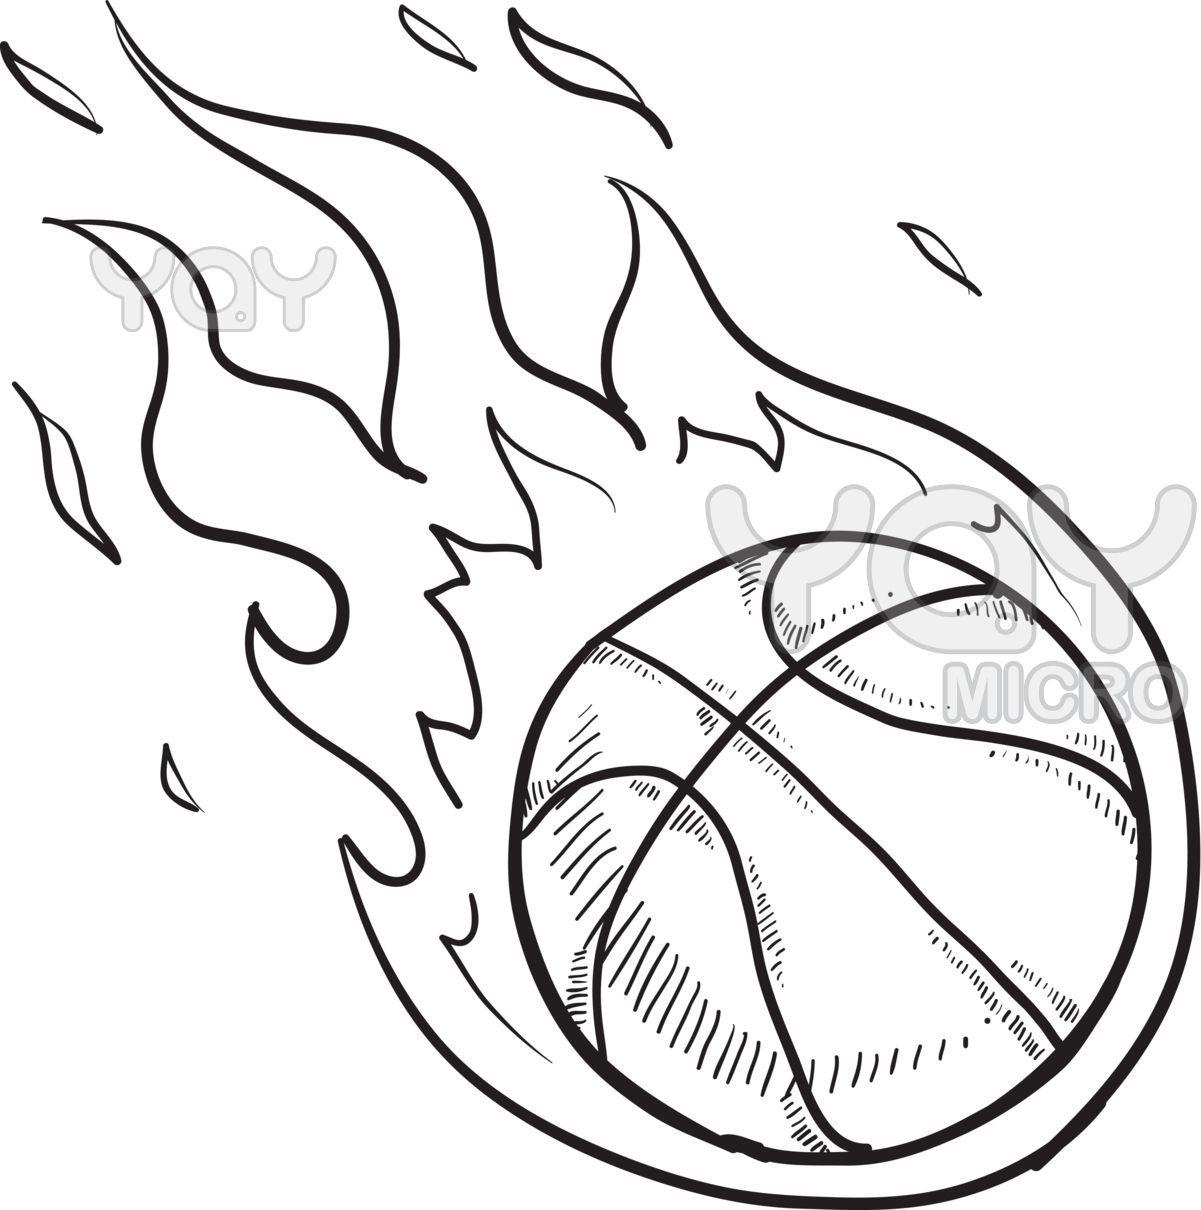 New Coloring Pages Basketball Free Ideias Para Cadernos Grafite